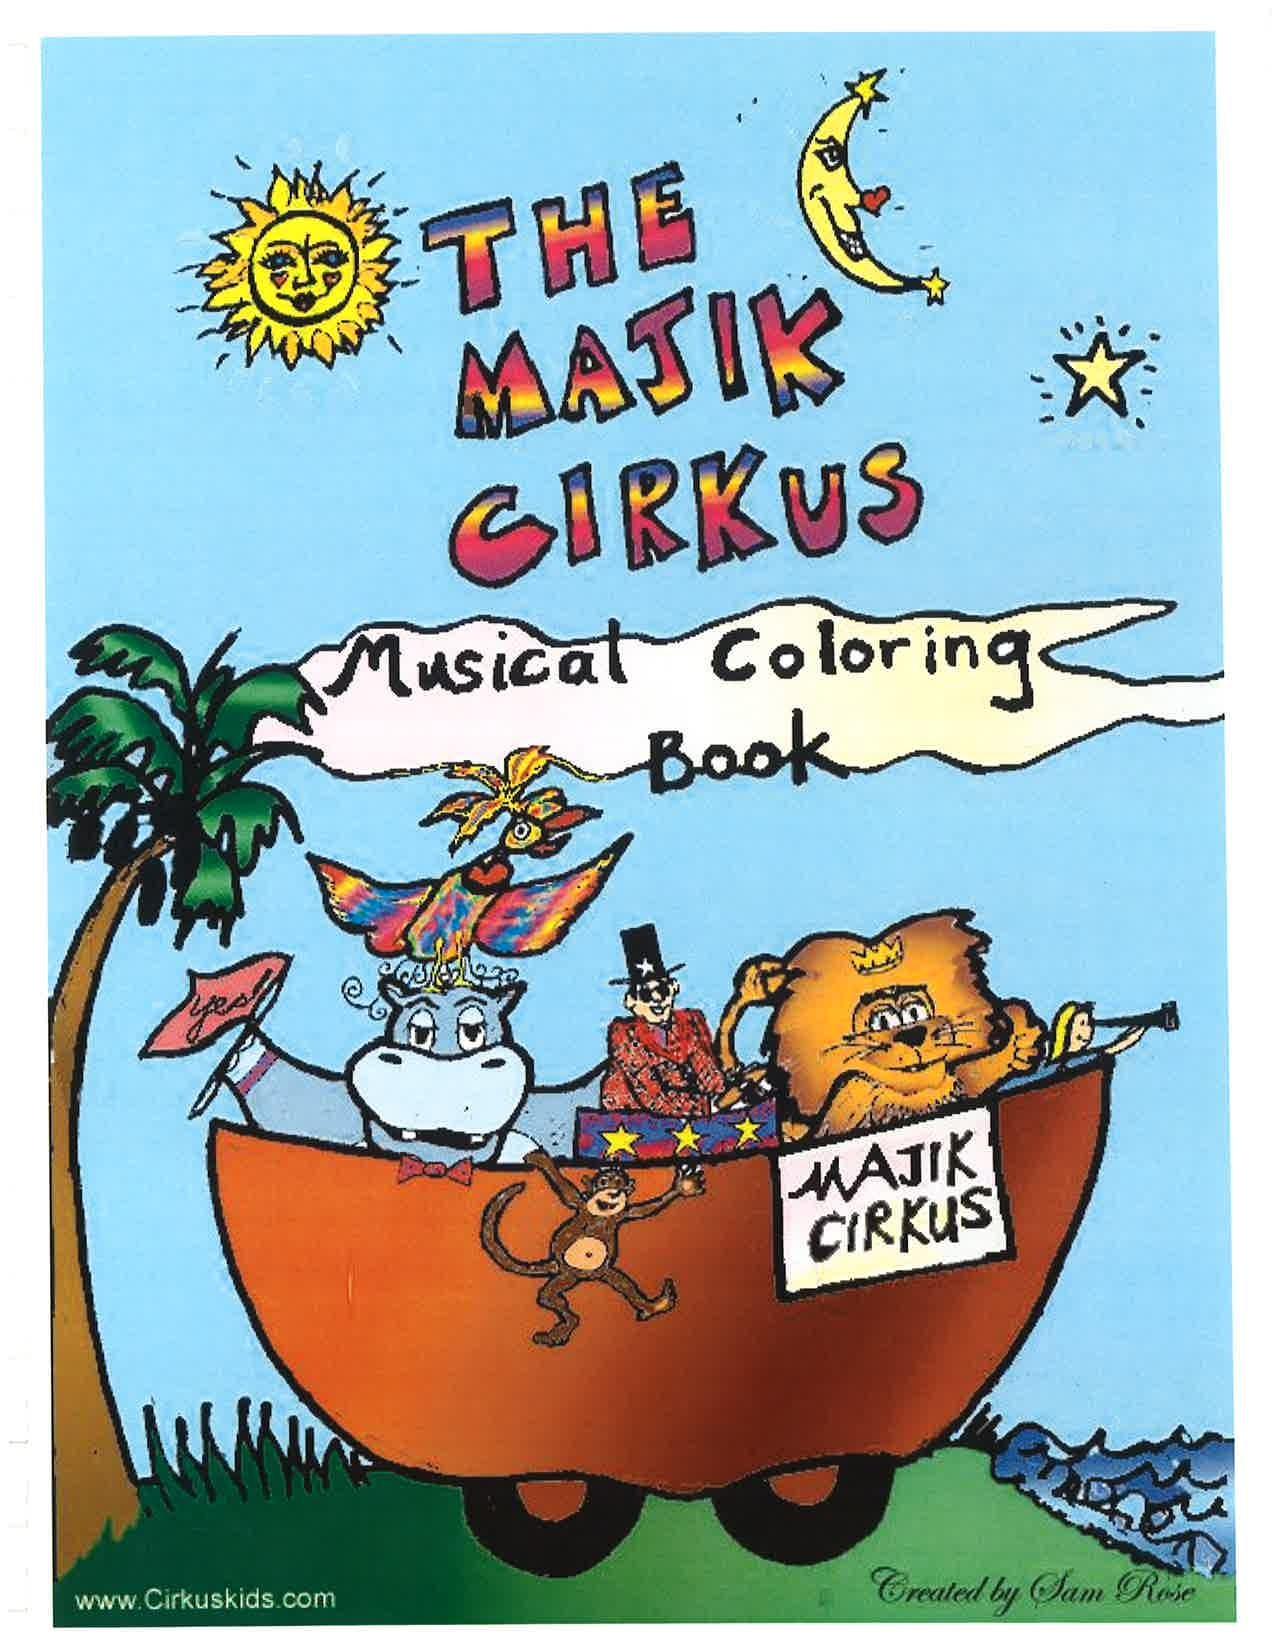 maijk cirkus color cover